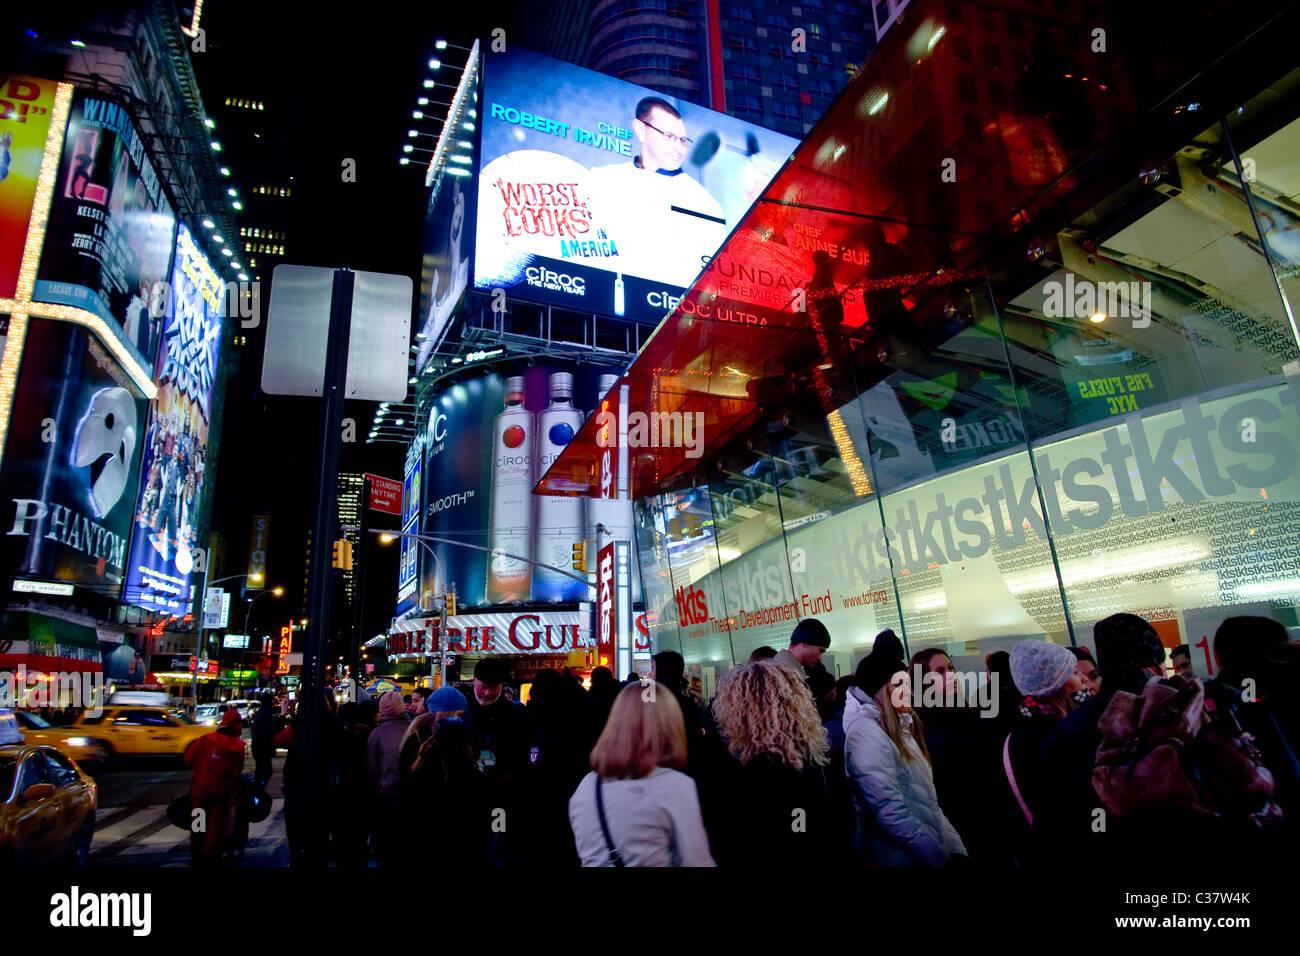 New York, NY - 22. Januar 2011: Times Square Menschen auf Linie für TKTS Broadway Tickets Stockbild